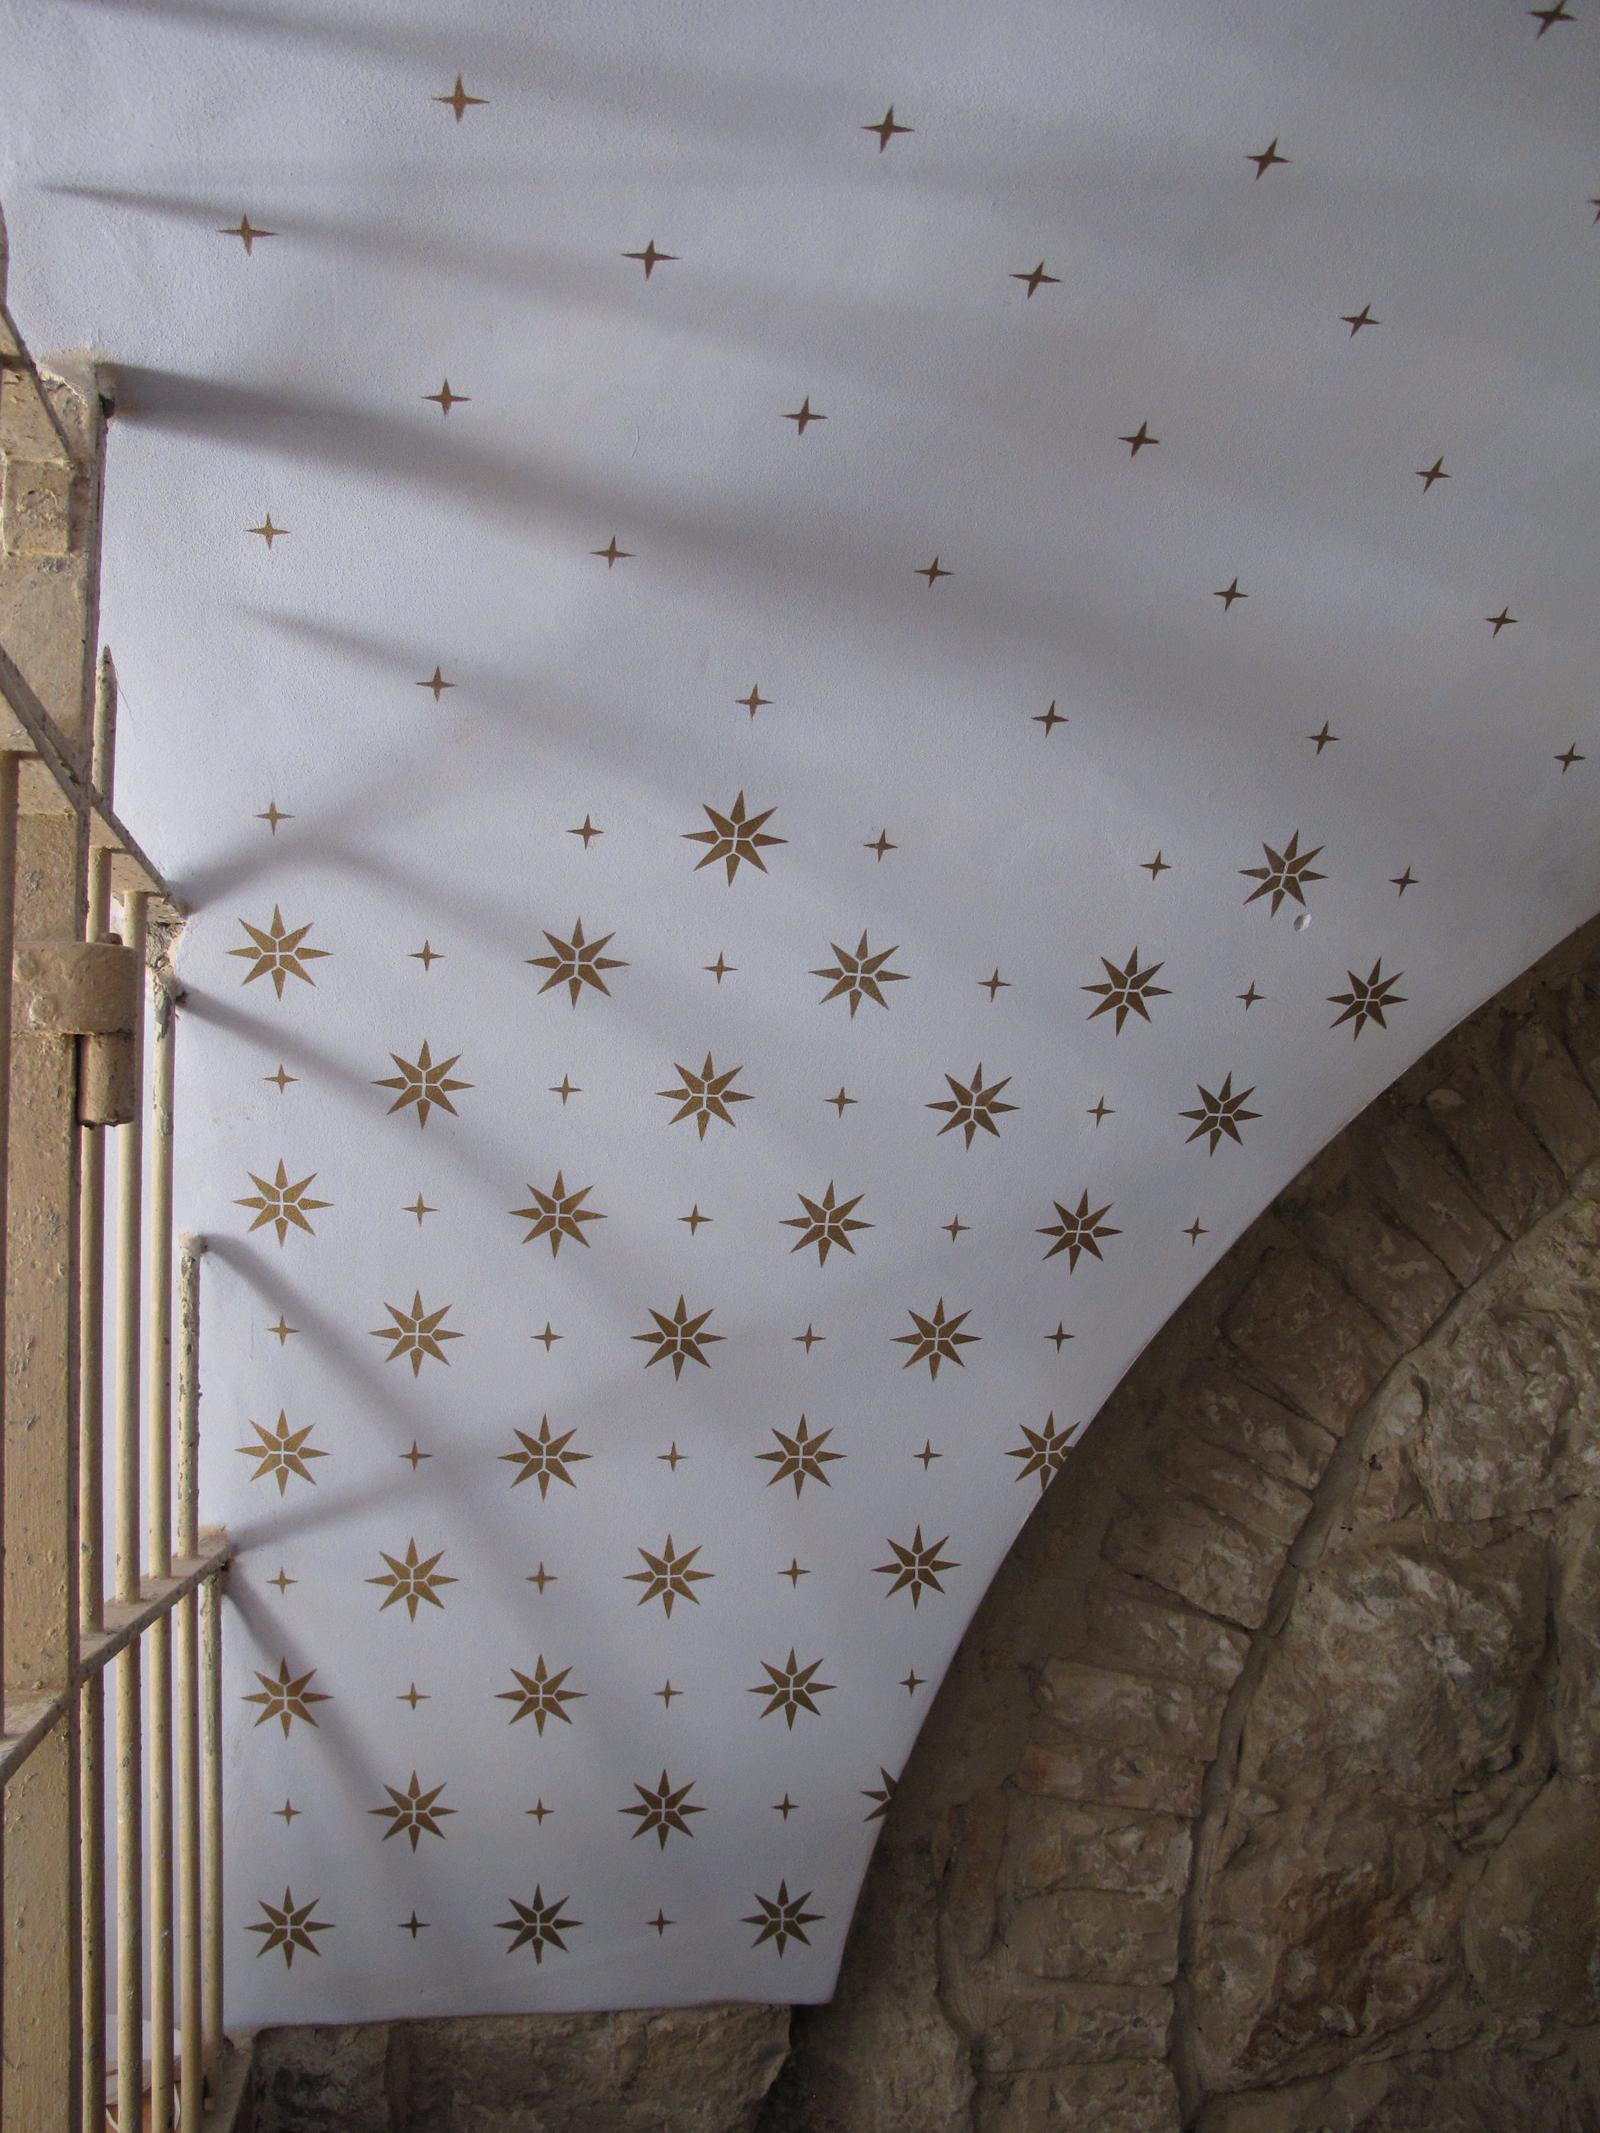 Ceiling painting at the underground academy, Mamuta Art and Media Center, Hansen House, Jerusalem